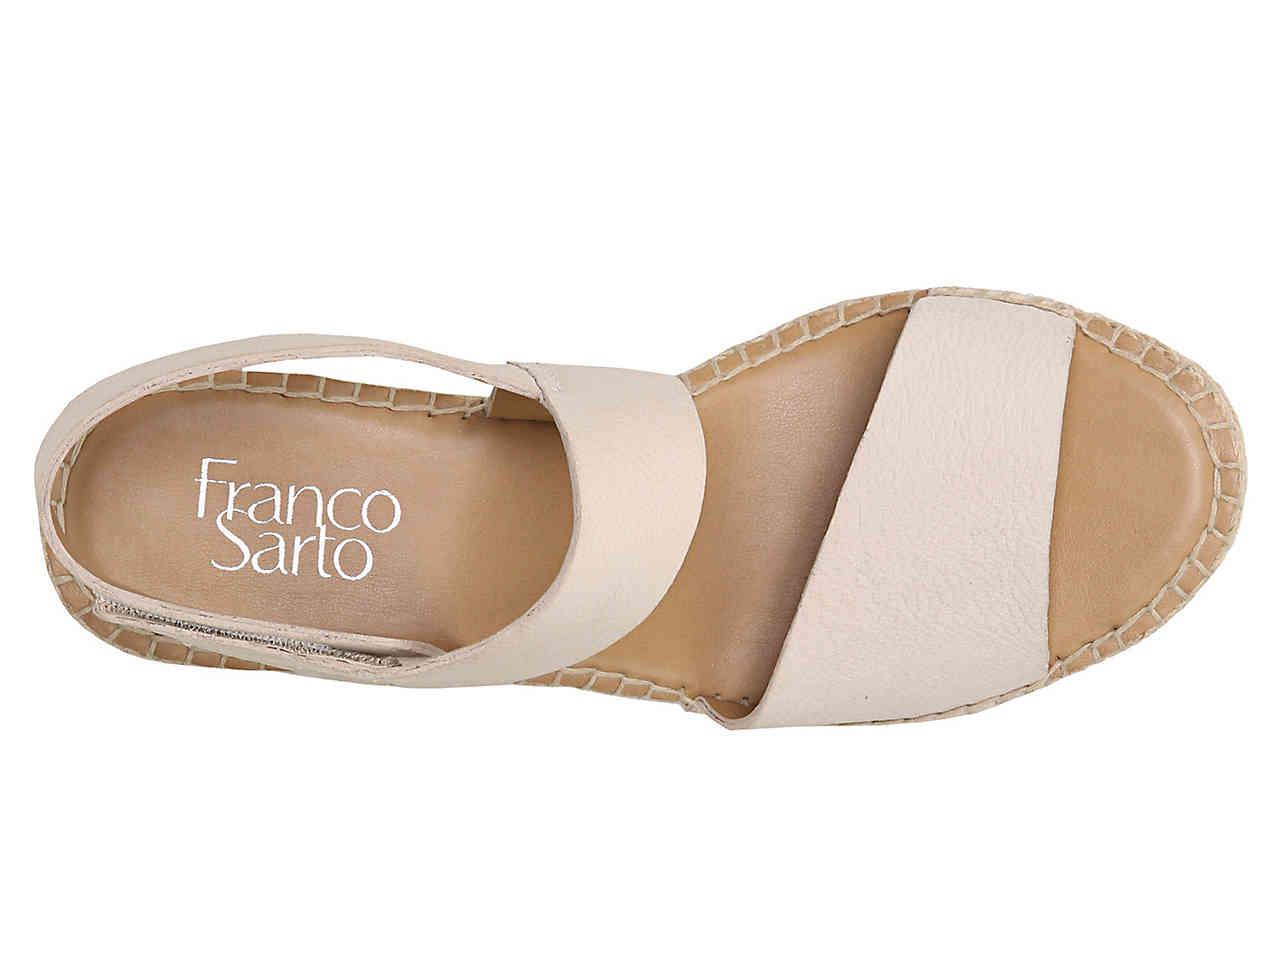 70f5c42ca8b Franco Sarto - Multicolor Tulsa Espadrille Wedge Sandal - Lyst. View  fullscreen